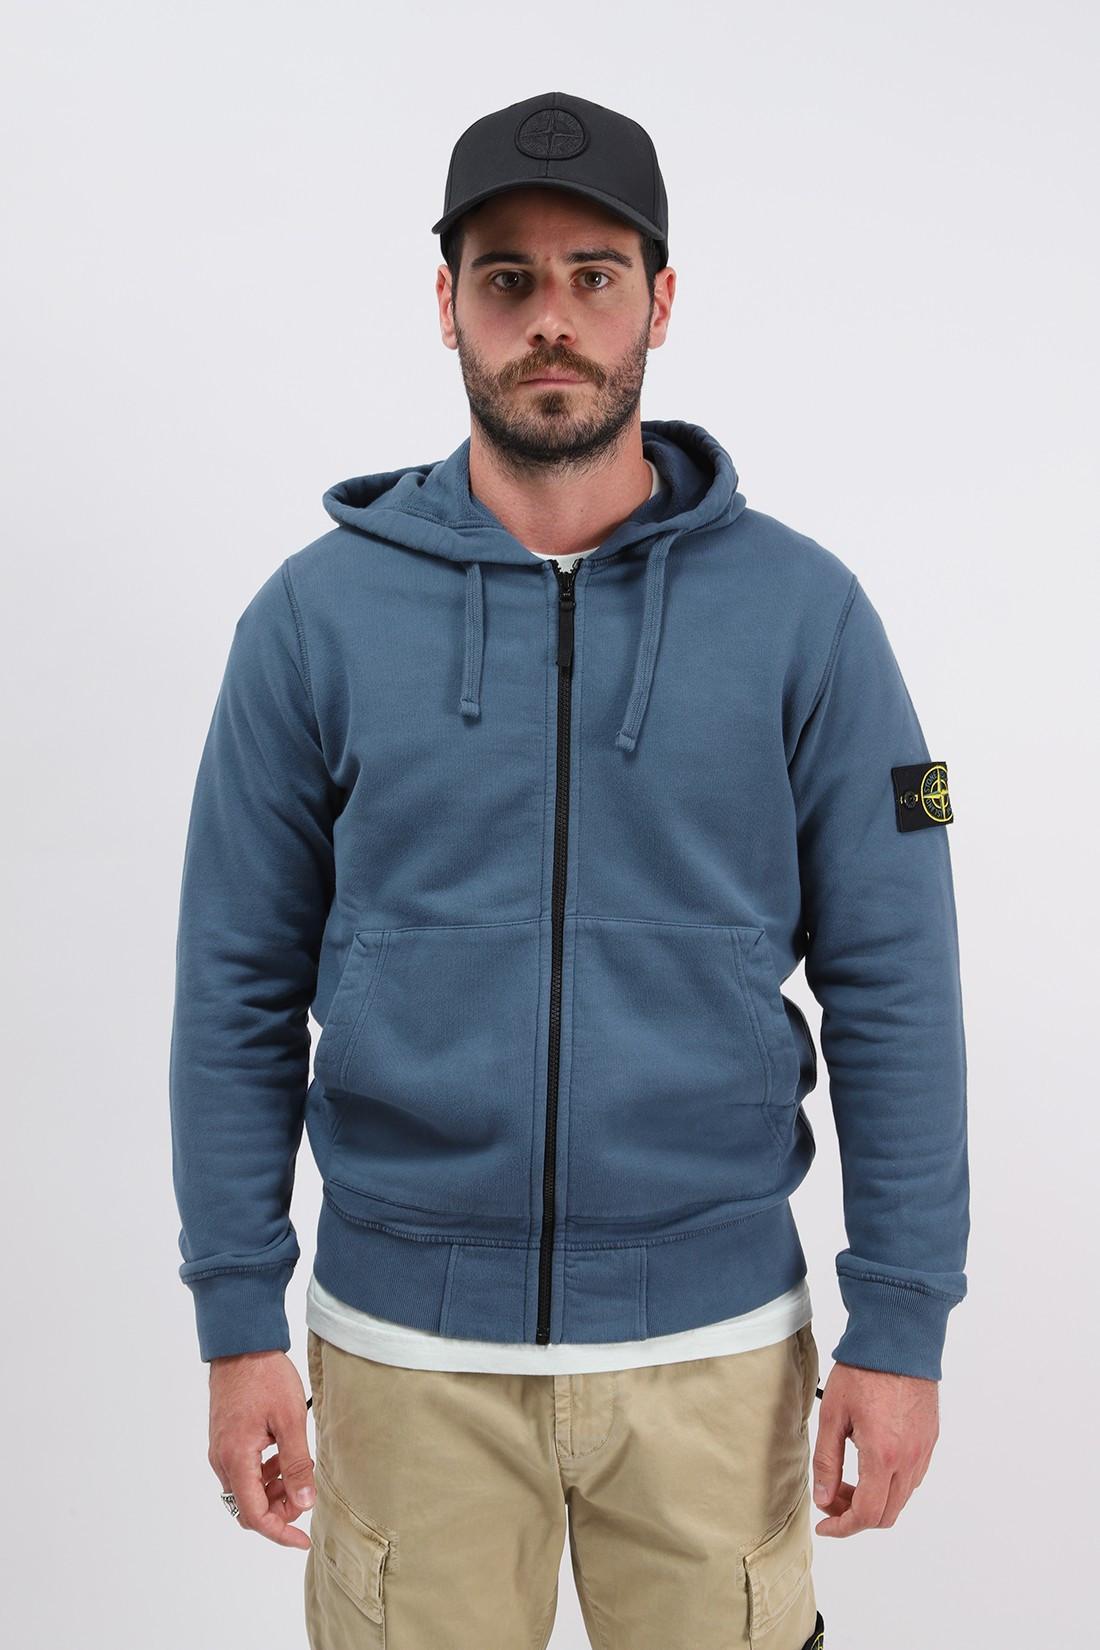 STONE ISLAND / 64220 hooded zip sweater v0023 Ottanio